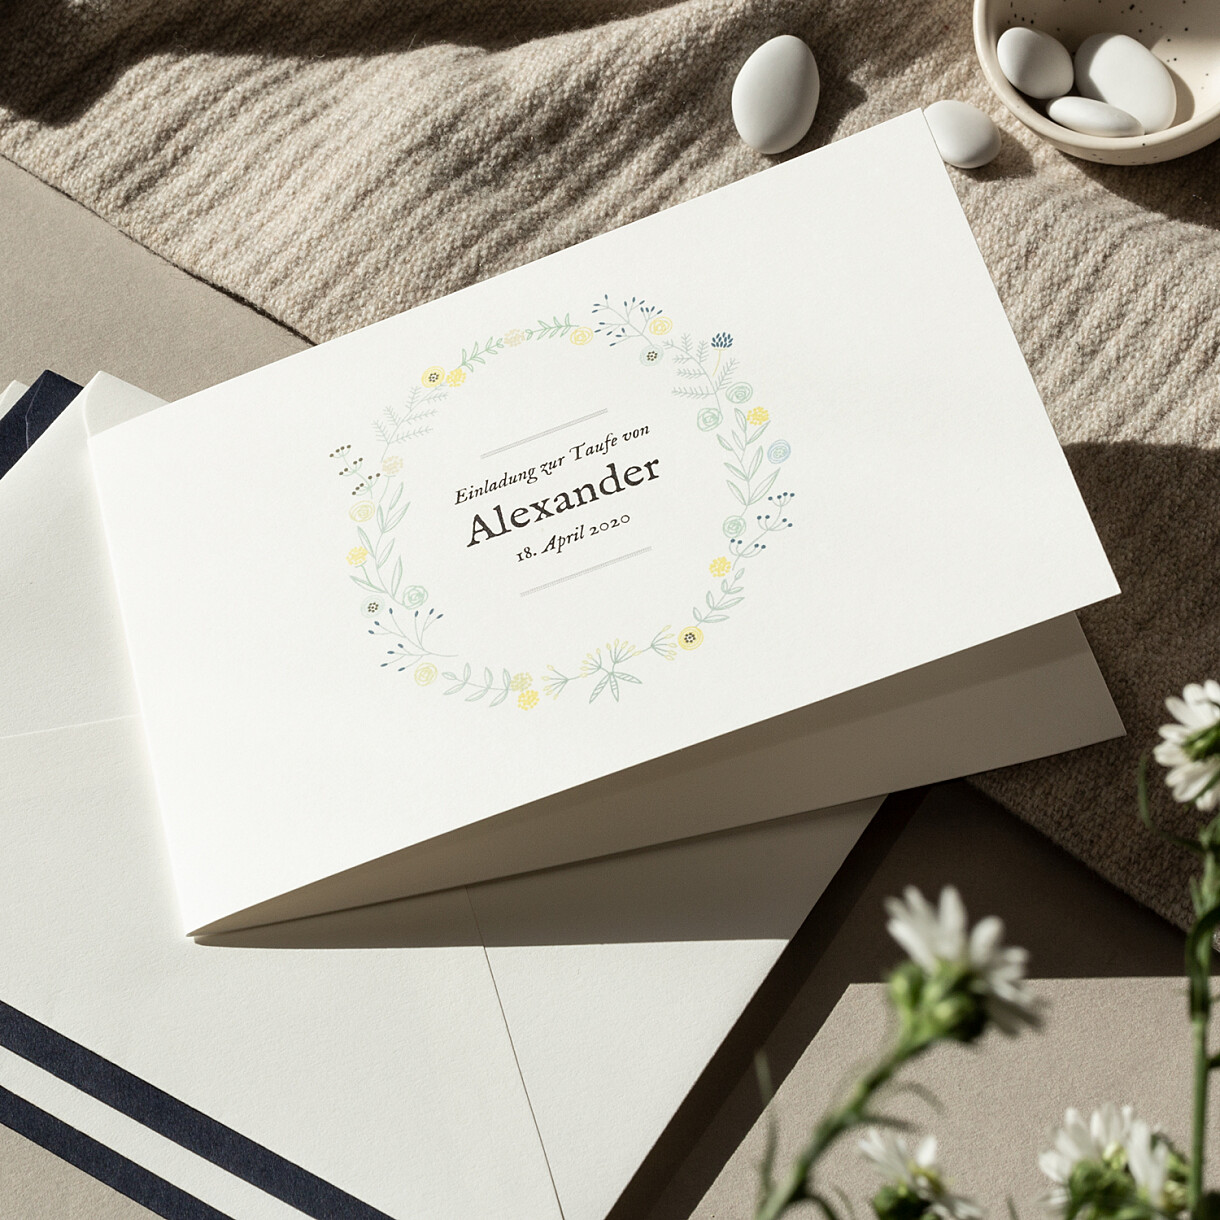 Taufeinladung Taufkarte Zu Gestalten Rosemood